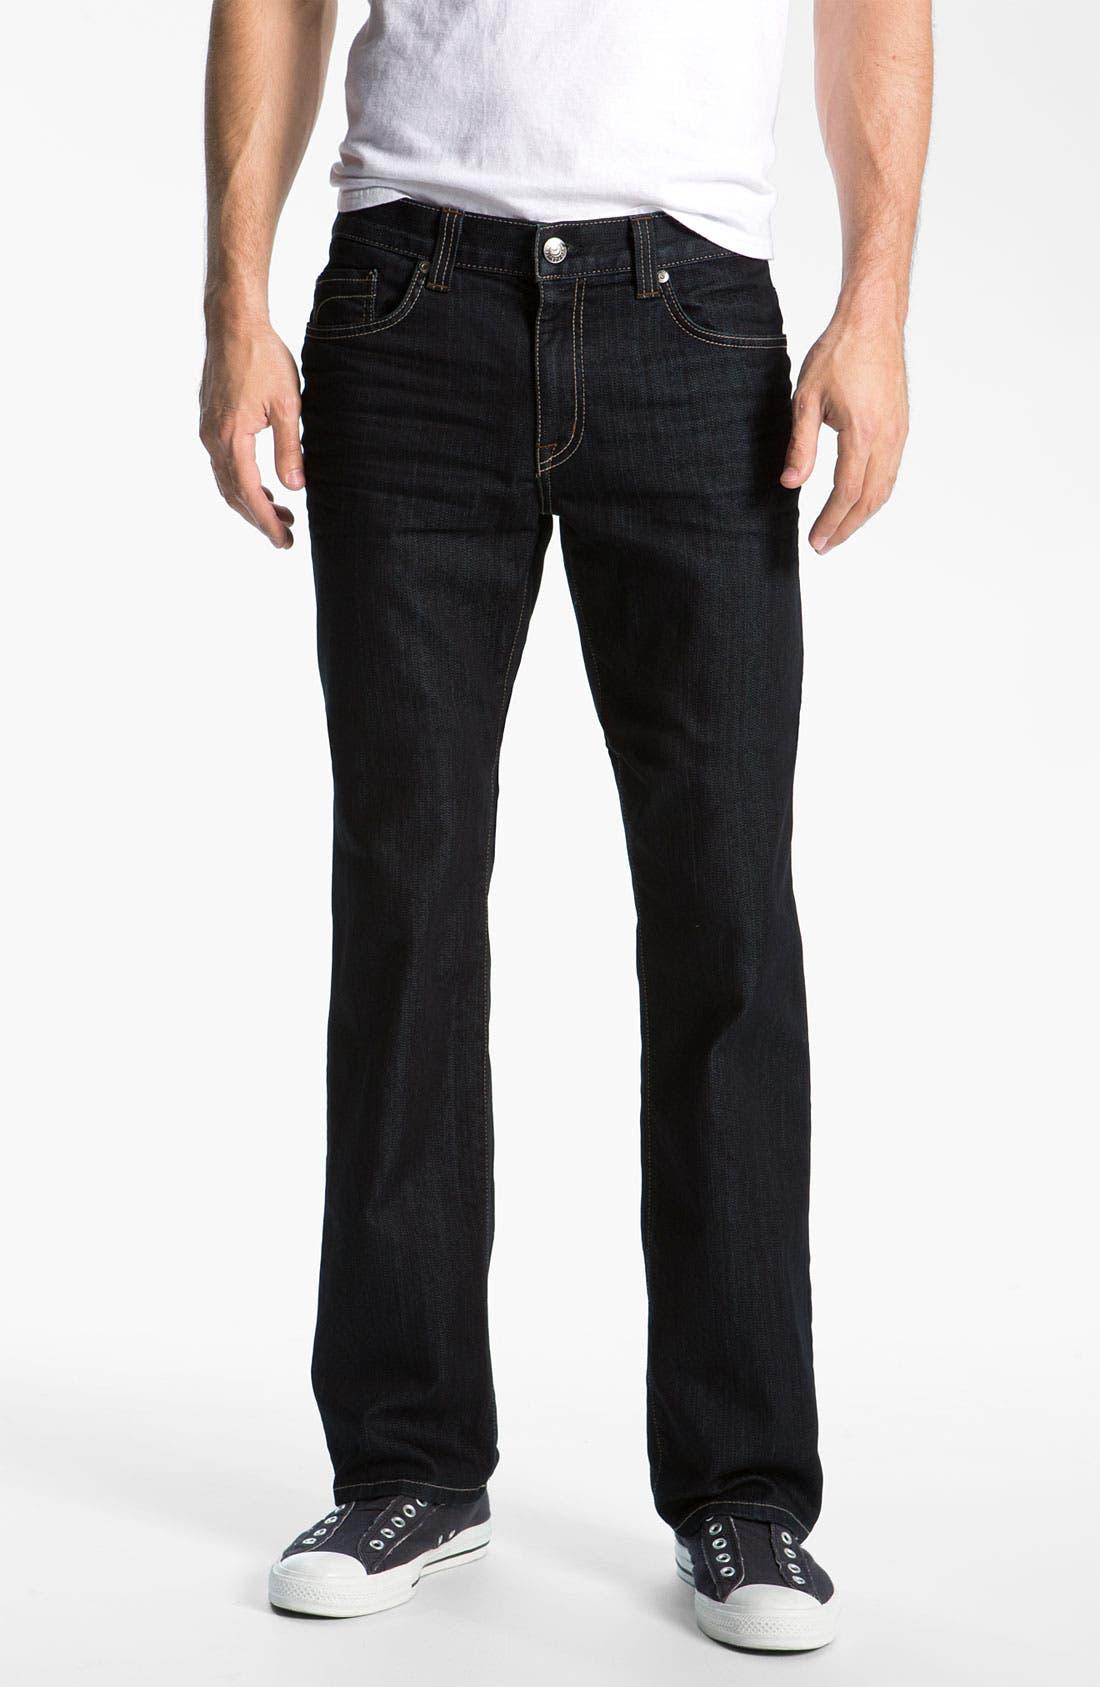 '50-11' Straight Leg Jeans,                         Main,                         color,